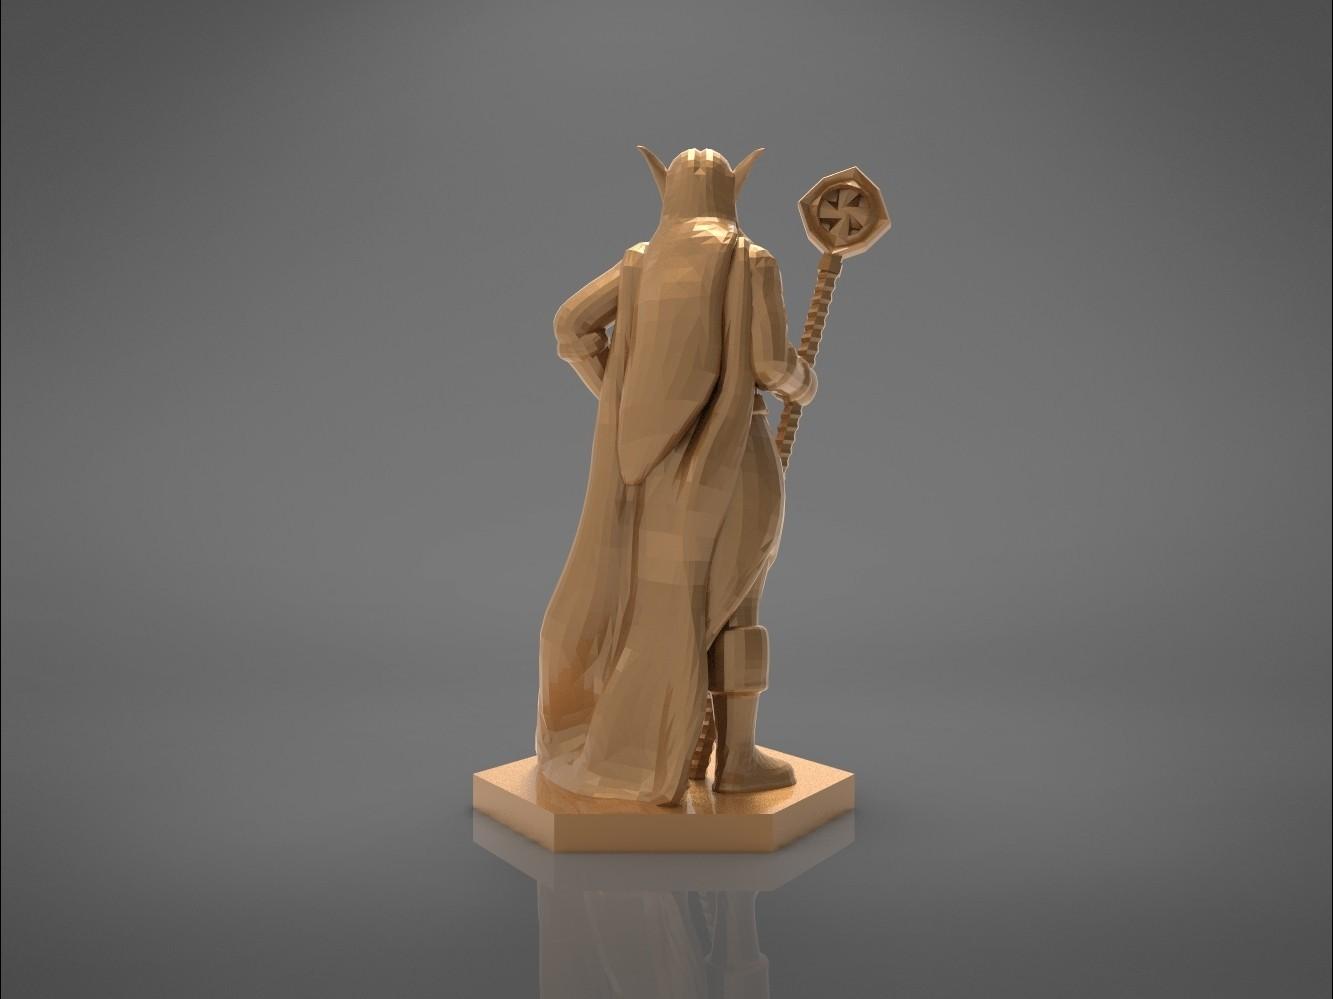 Mage_2_-back_perspectivve.161.jpg Download STL file ELF MAGE FEMALE CHARACTER GAME FIGURES 3D print model • 3D printing template, 3D-mon